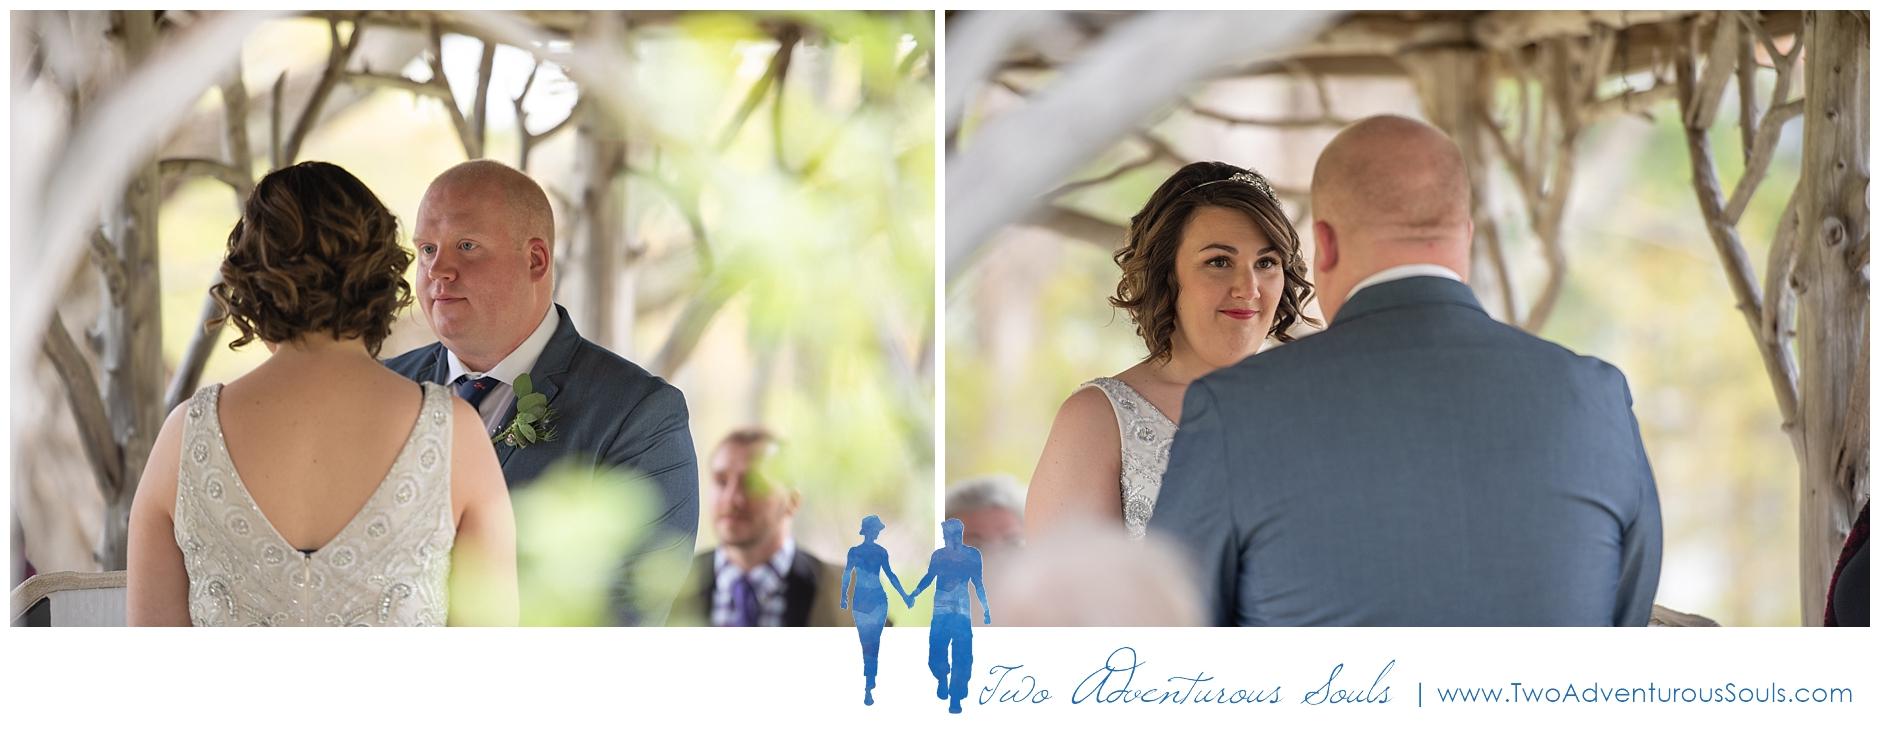 Norumbega Inn Wedding by Maine Wedding Photographers - Camden Wedding - 5